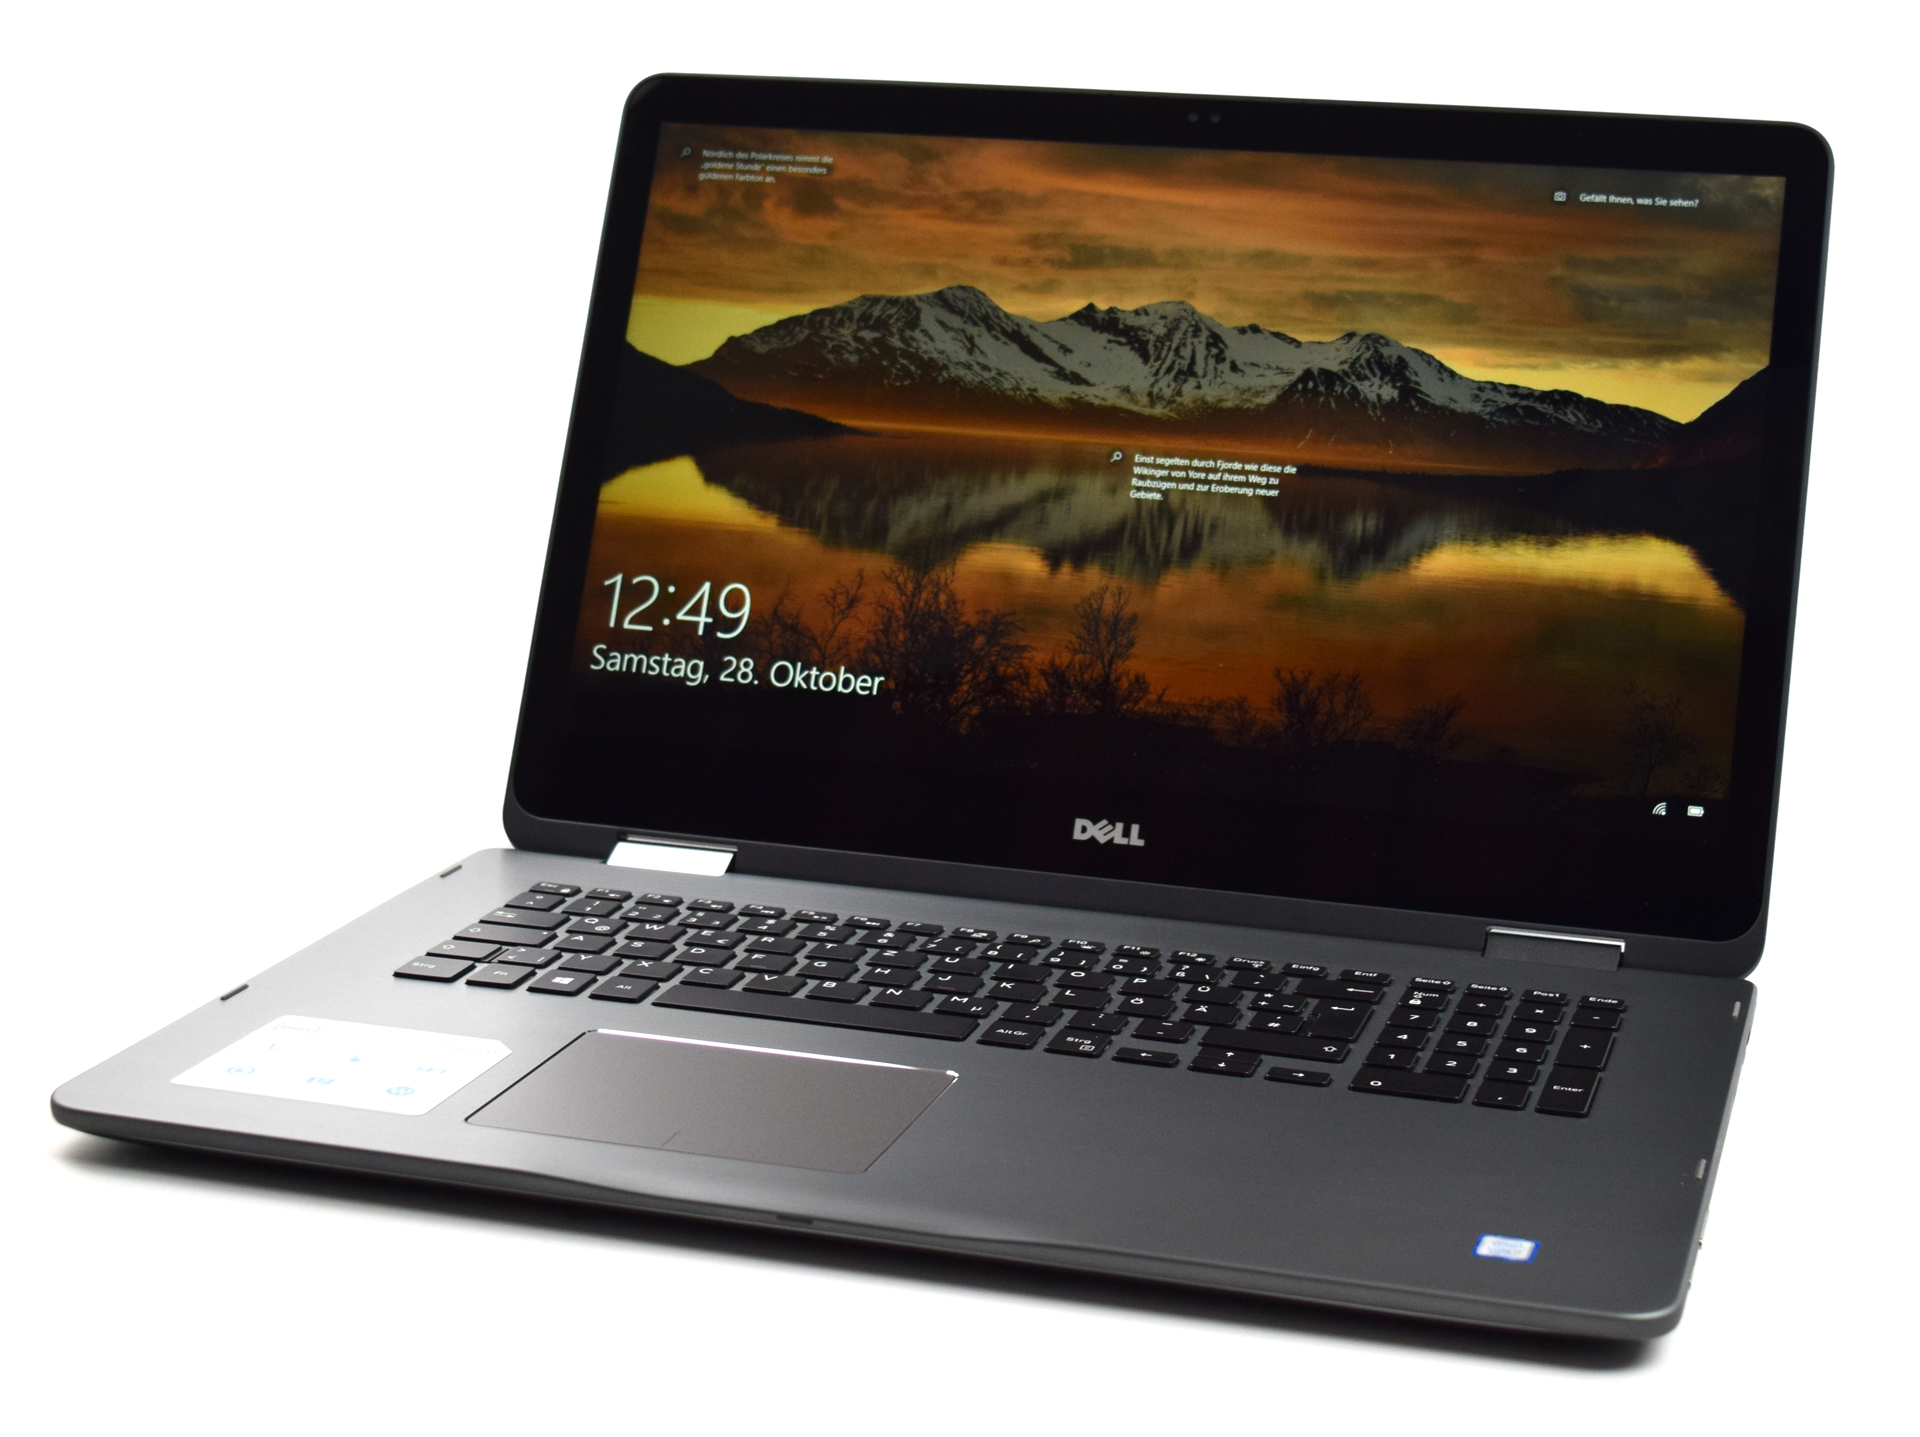 6db12d496391 Dell Inspiron 17 7773 (i7-8550U, 16 GB, 17